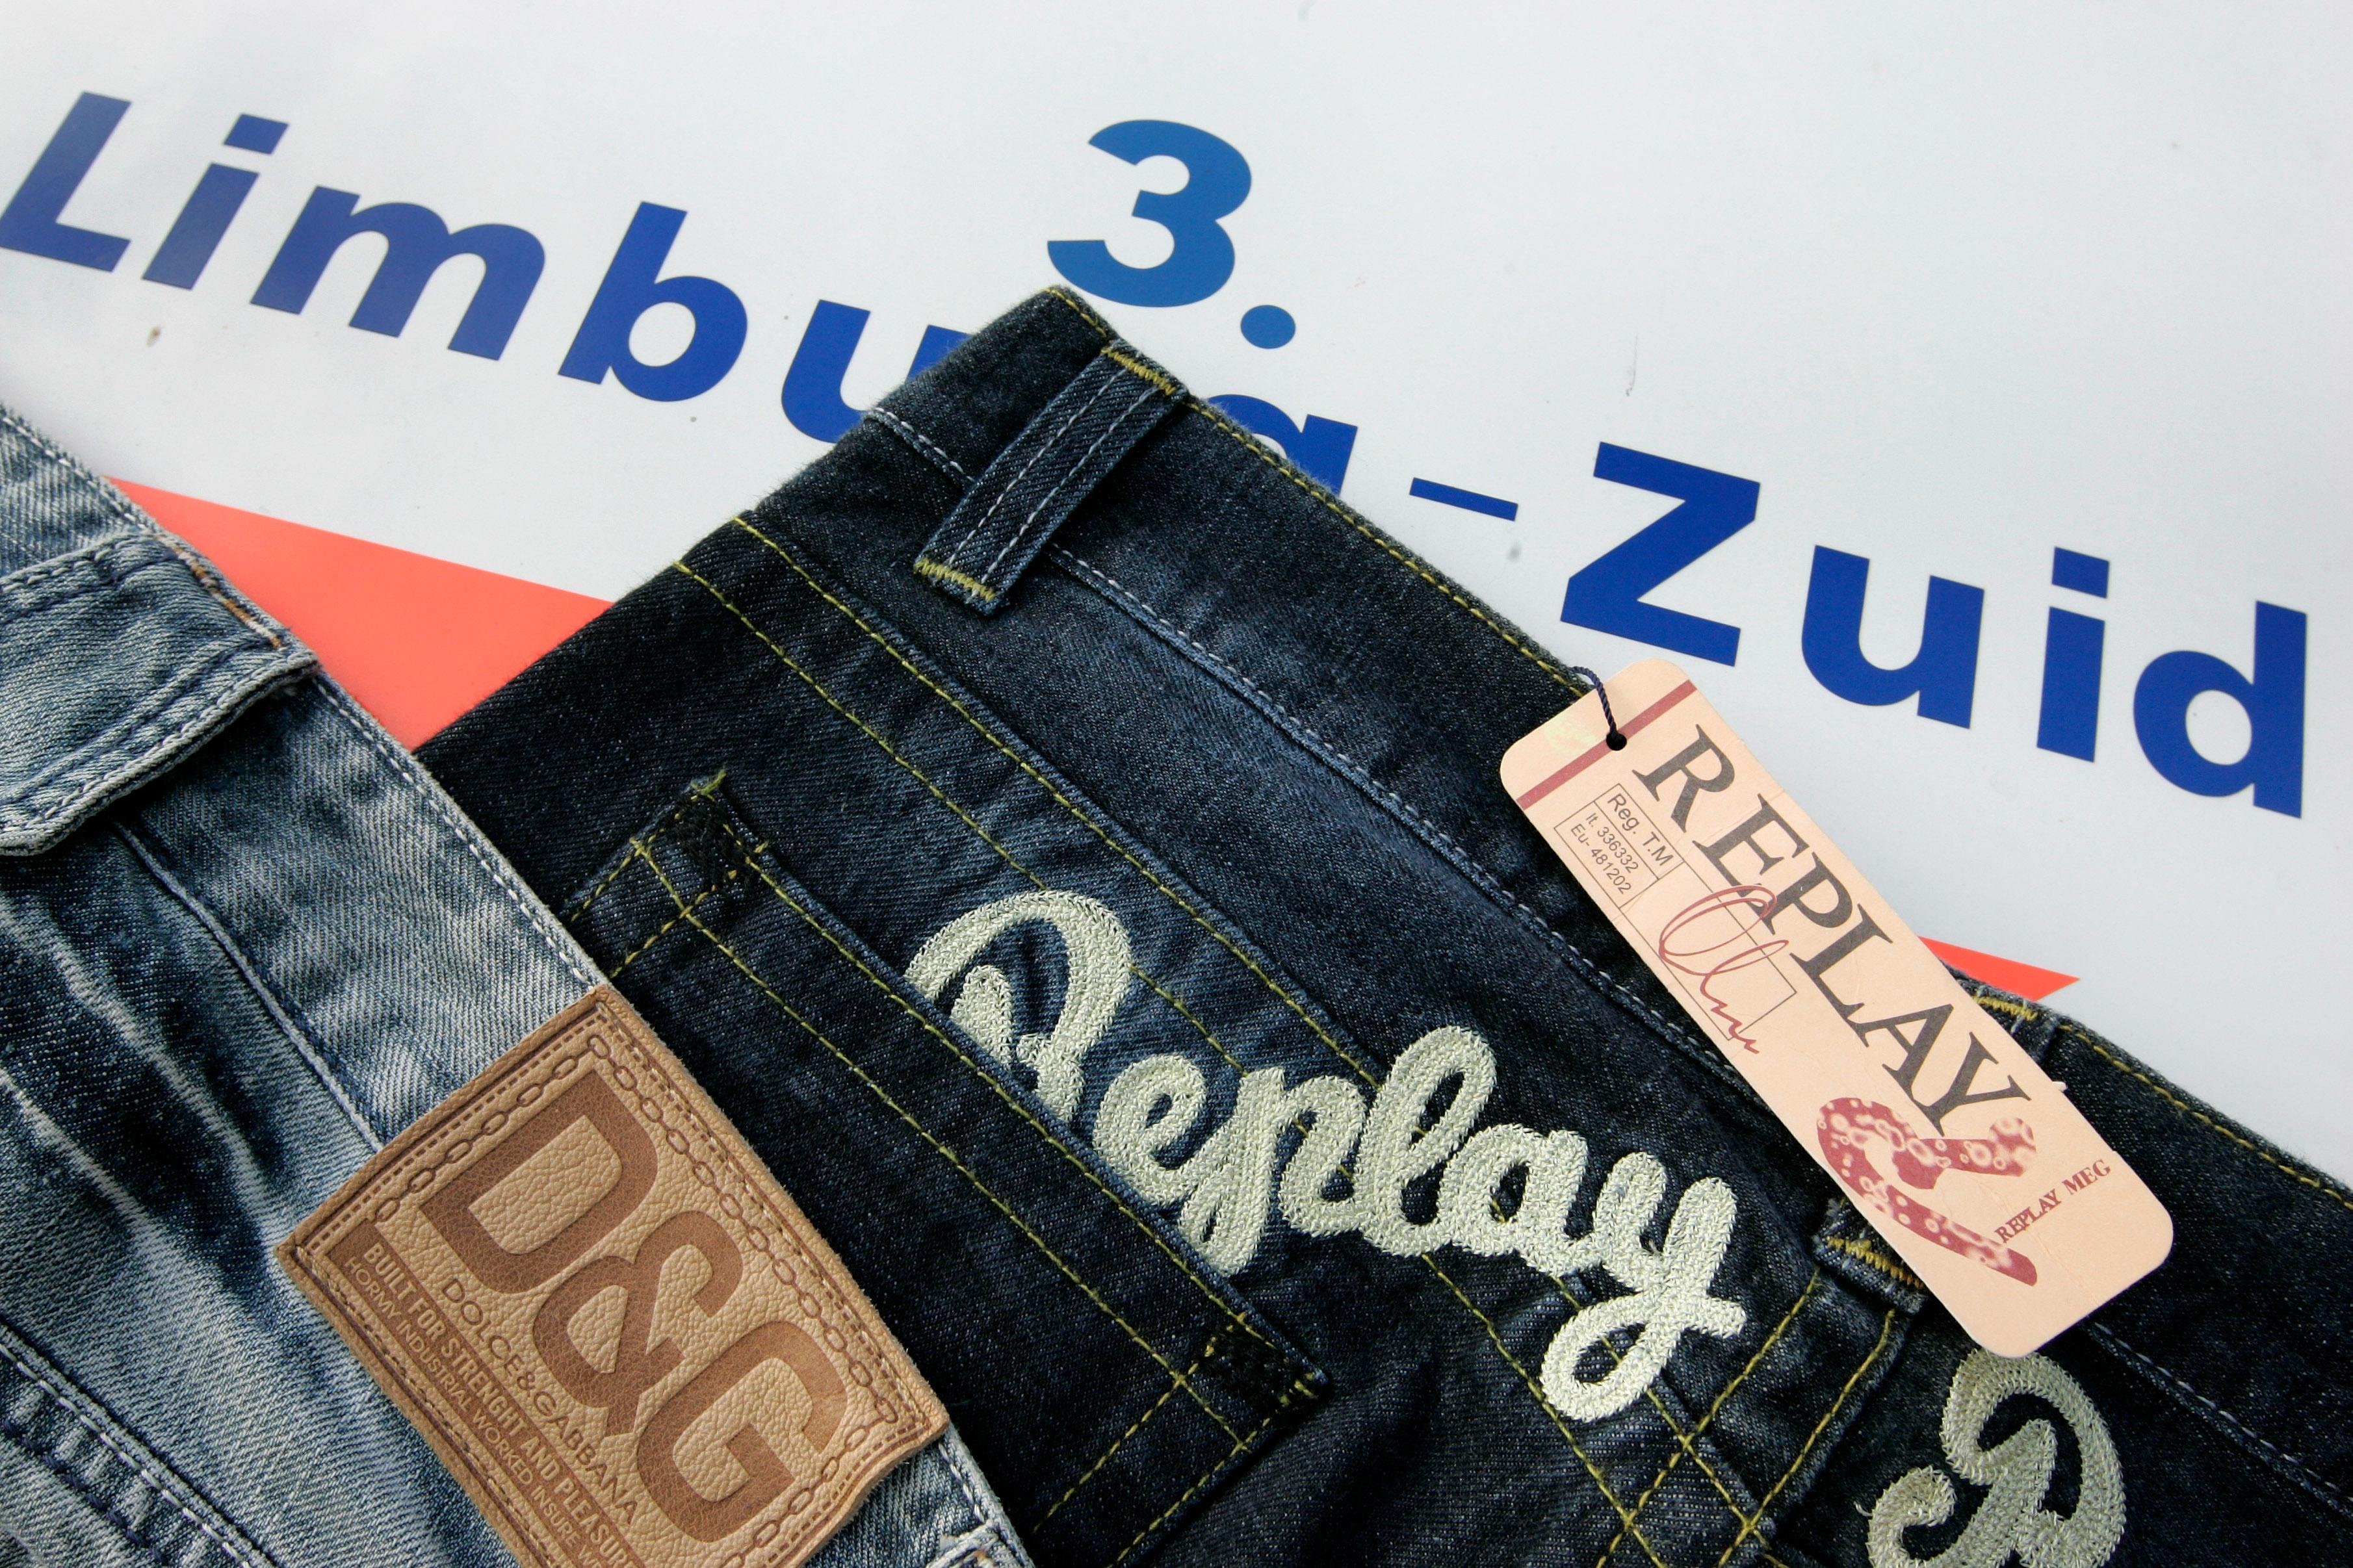 f4e65bf4381 'Steeds vaker nepspullen verkocht via Instagram'   Binnenland   Telegraaf.nl